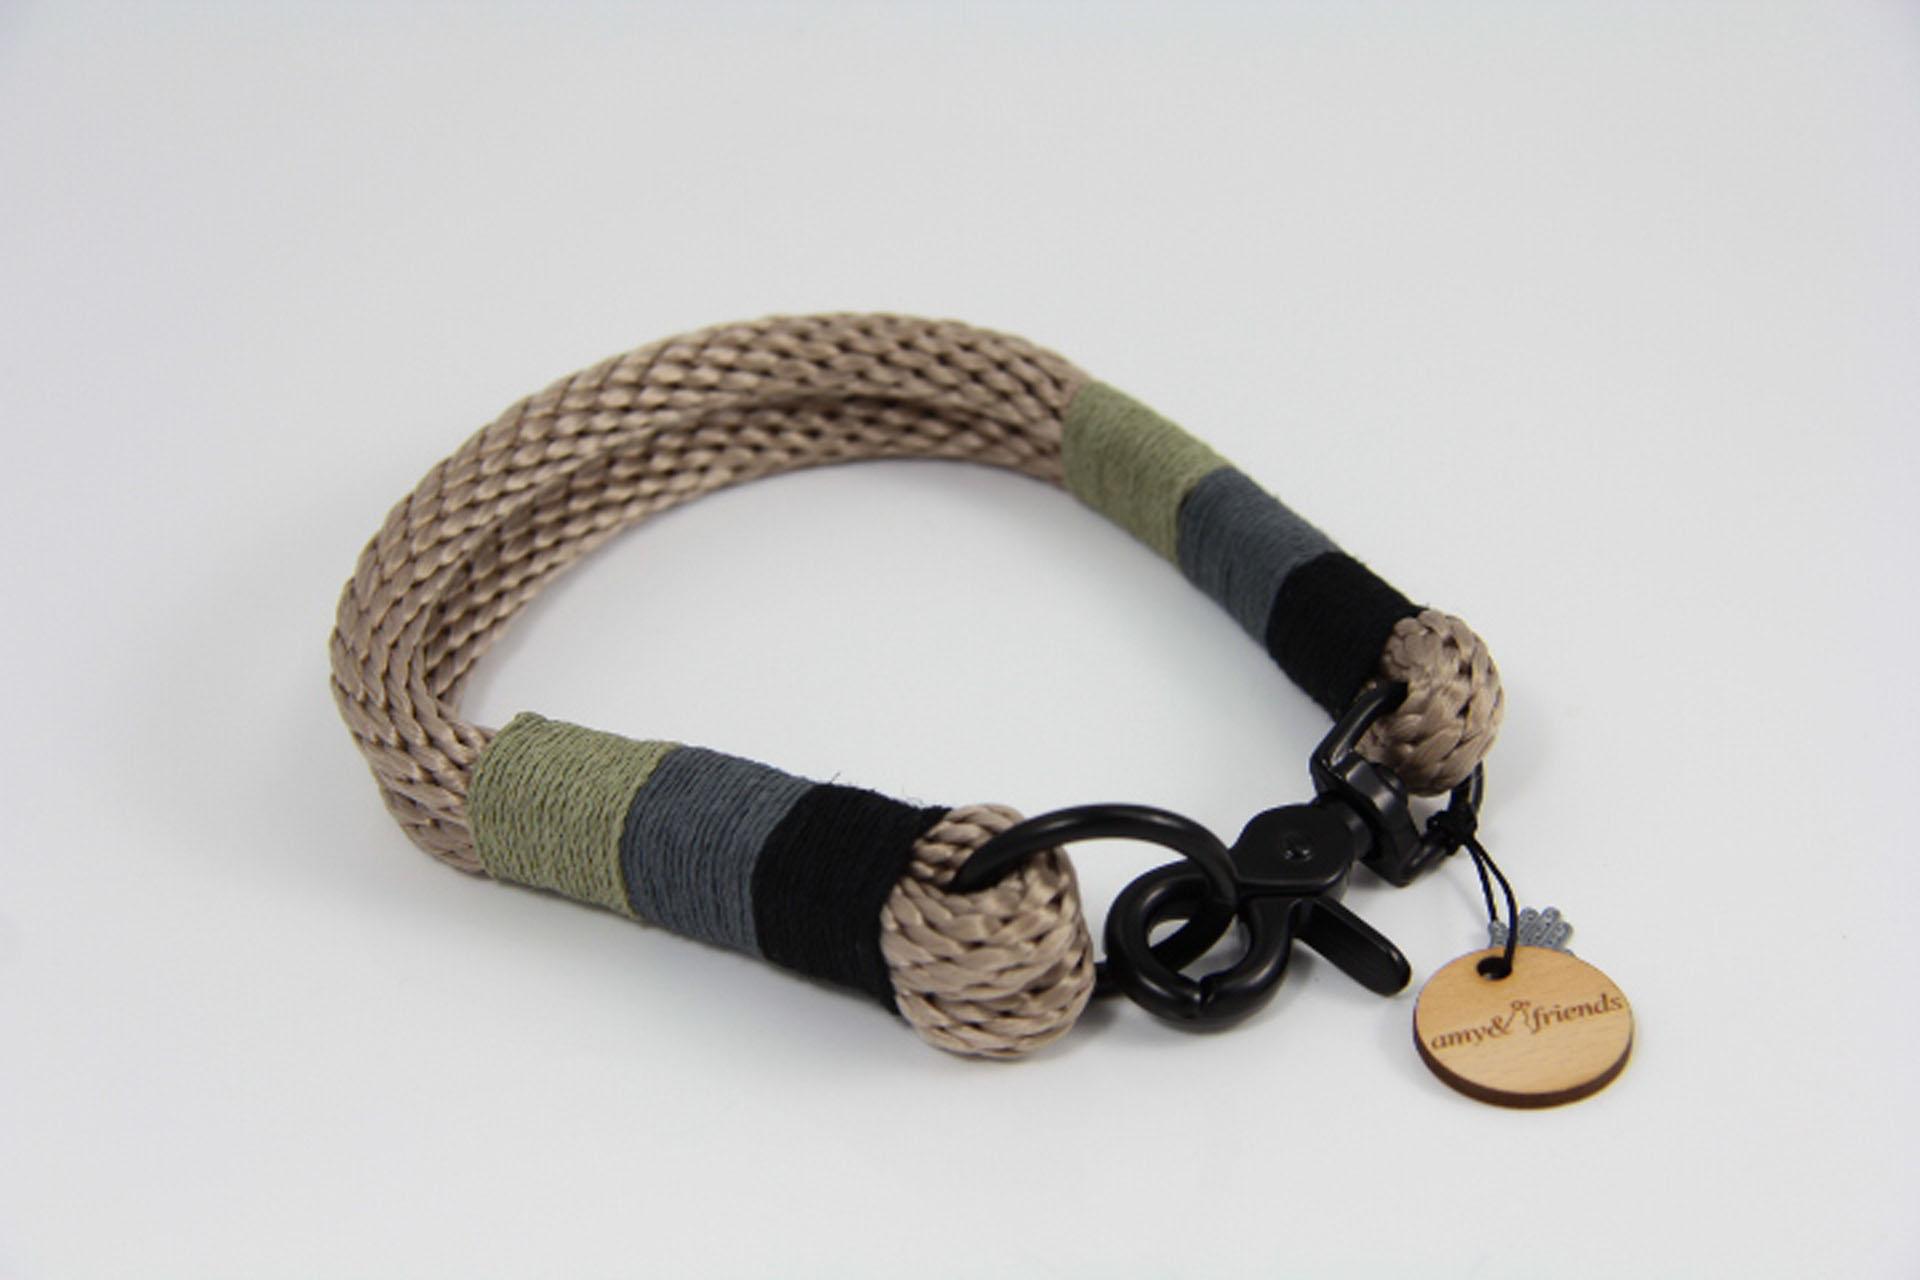 Tauhalsband-amy-and-friend-tan-schwarz-dunkelgrau-oliv